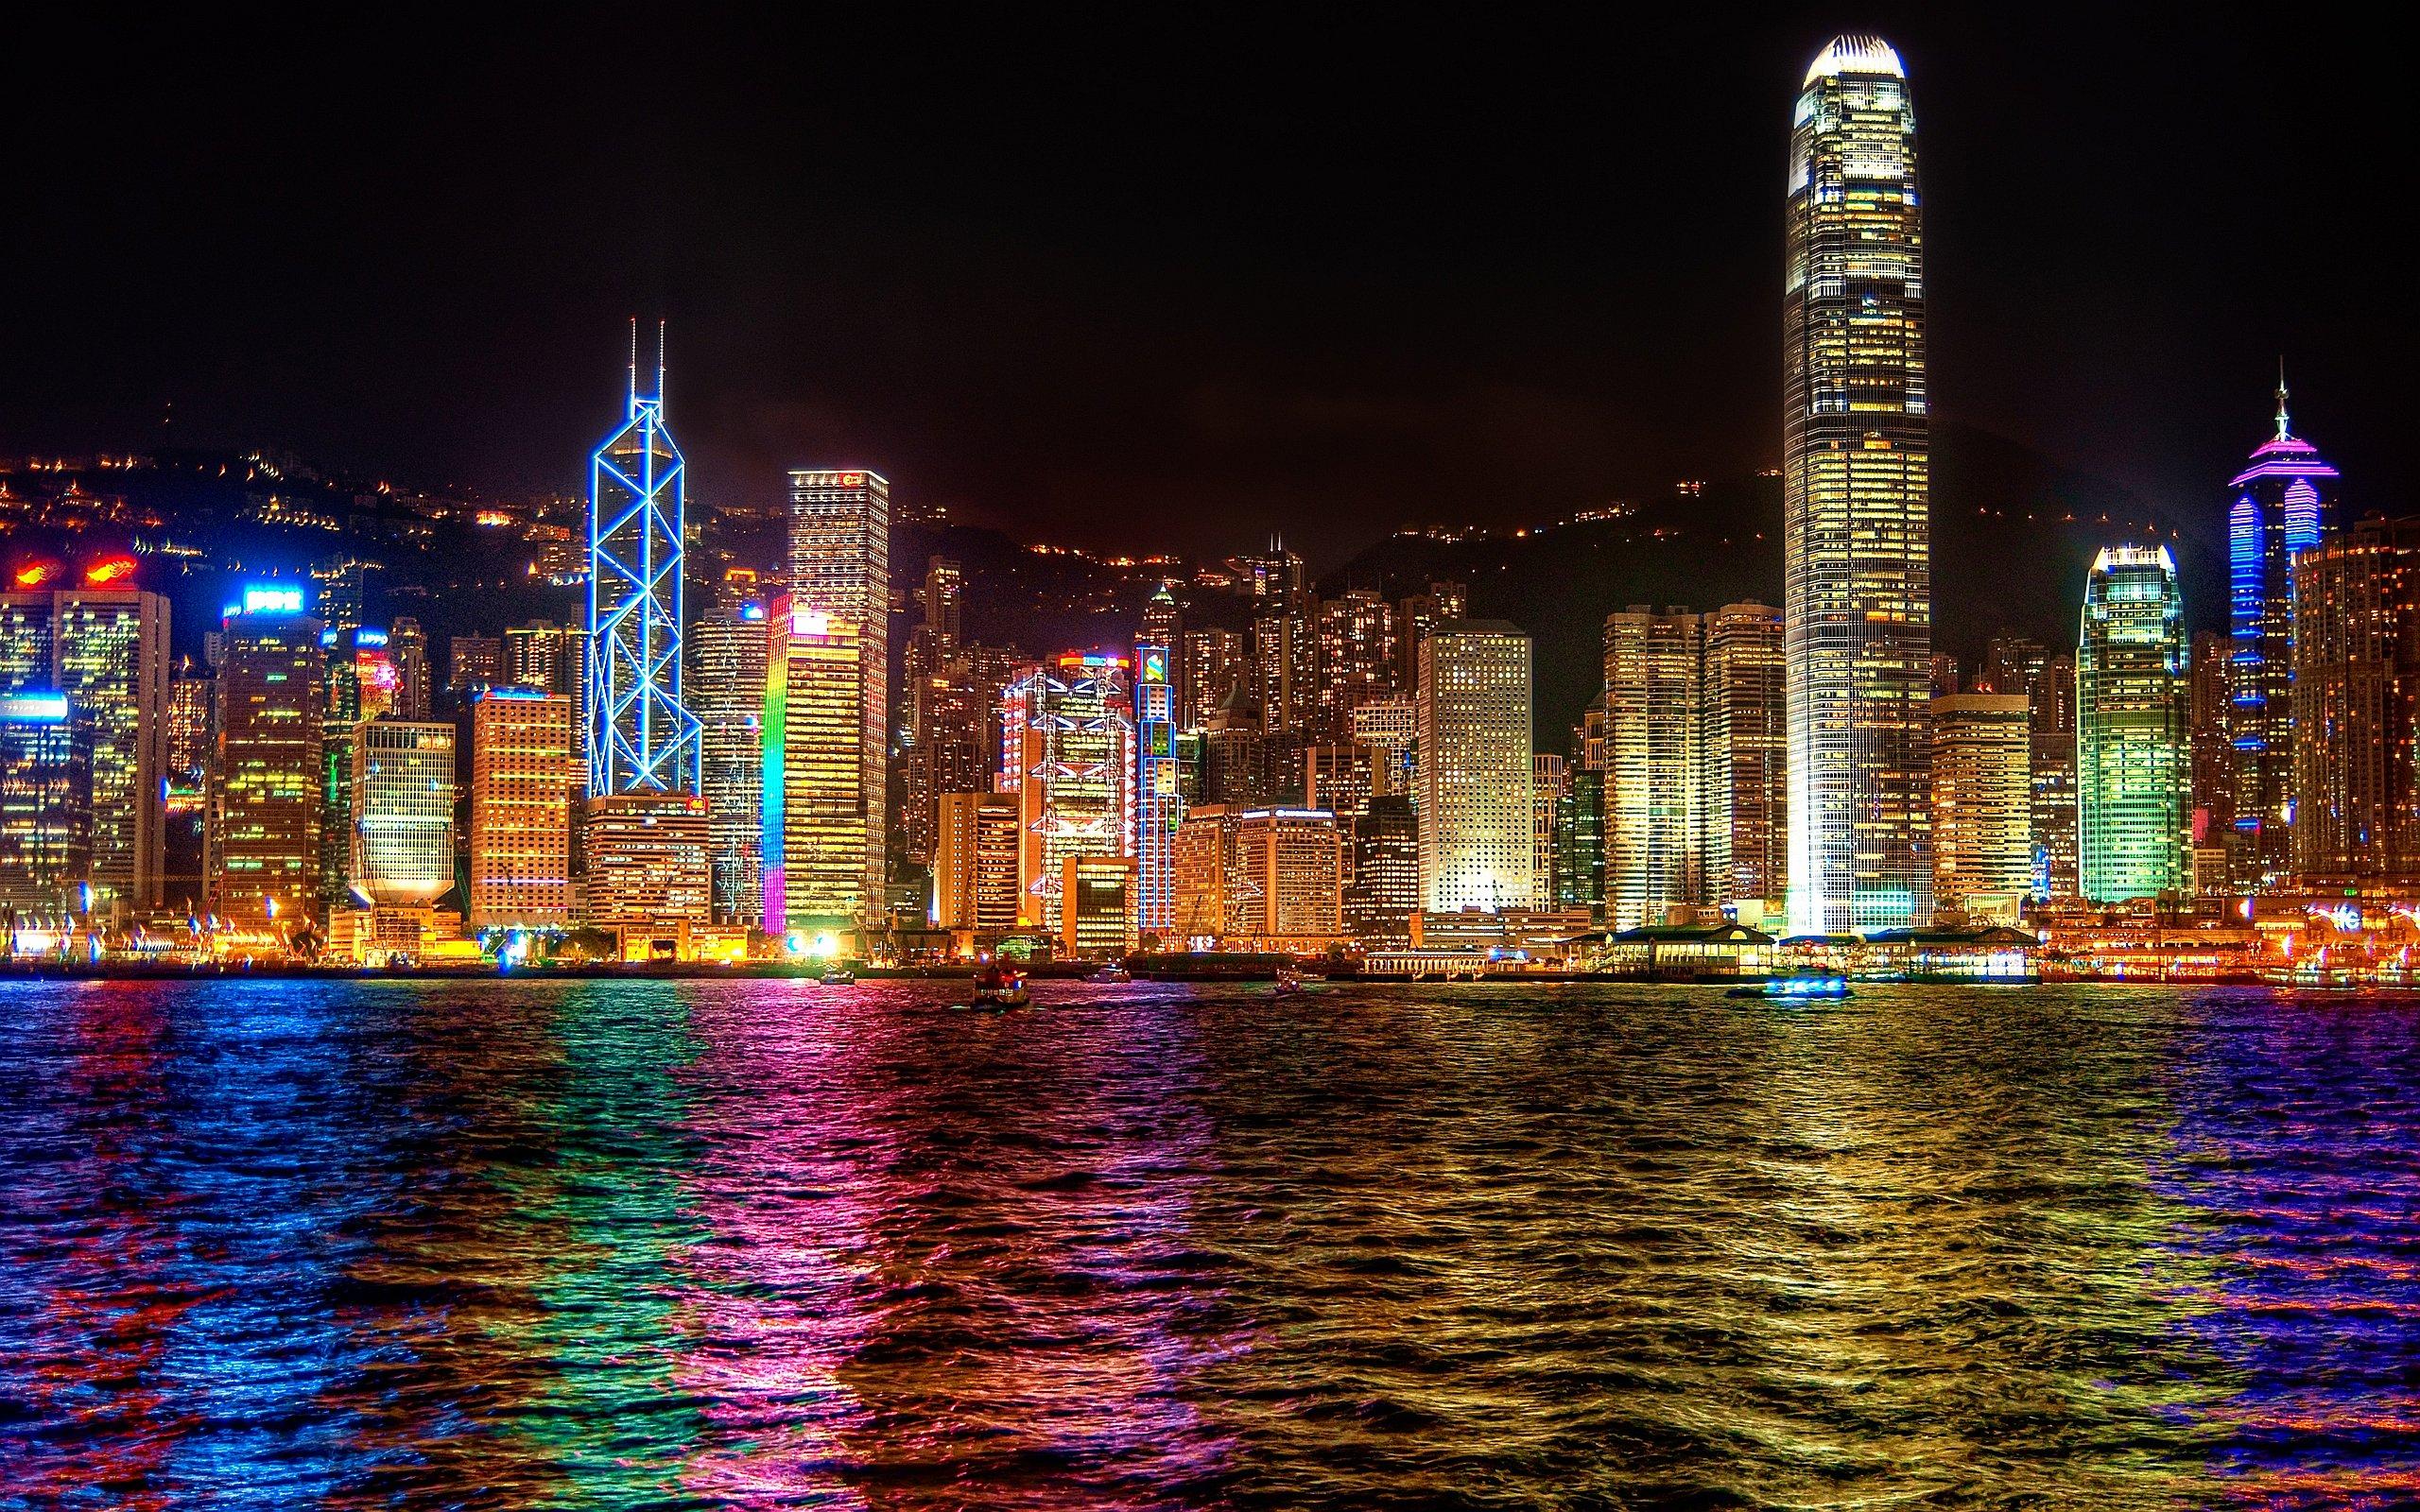 Photo Credit http://www.hotelroomsearch.net/top-destinations/hong-kong